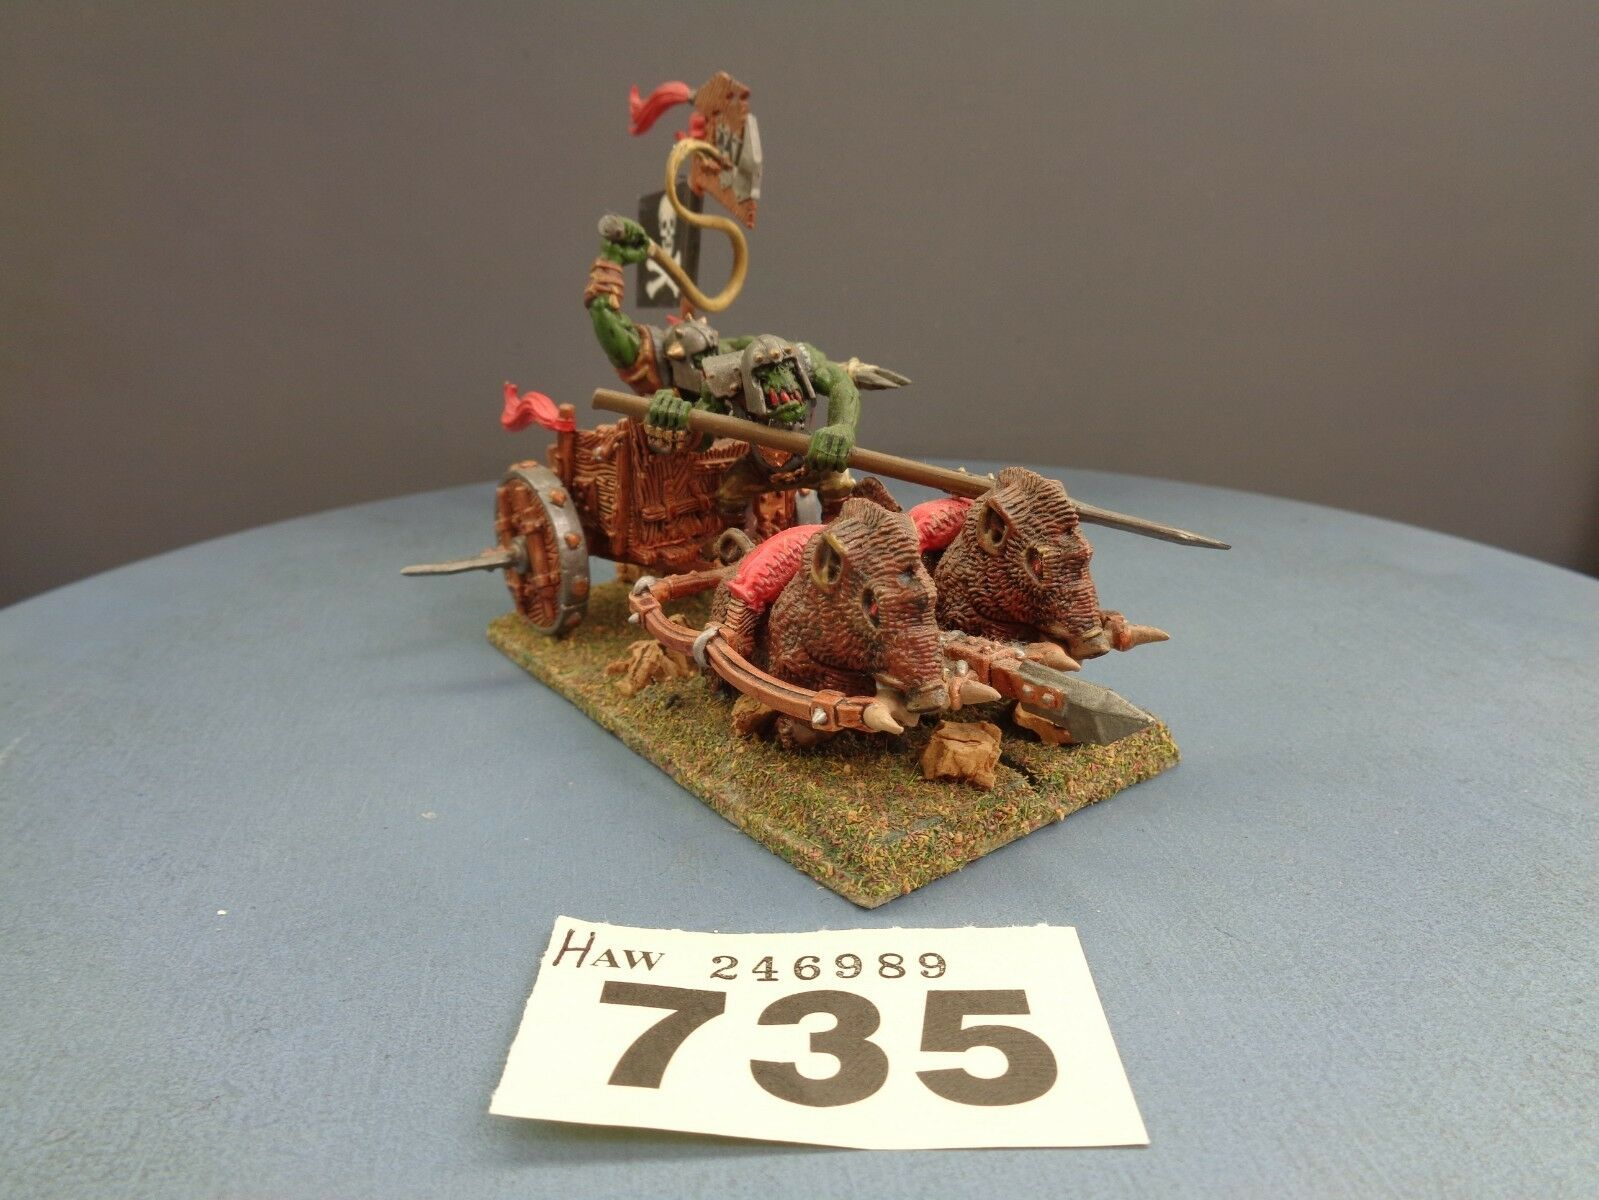 Warhammer Age of Sigmar Orruks Orcs Goblins Boar Chariot 735